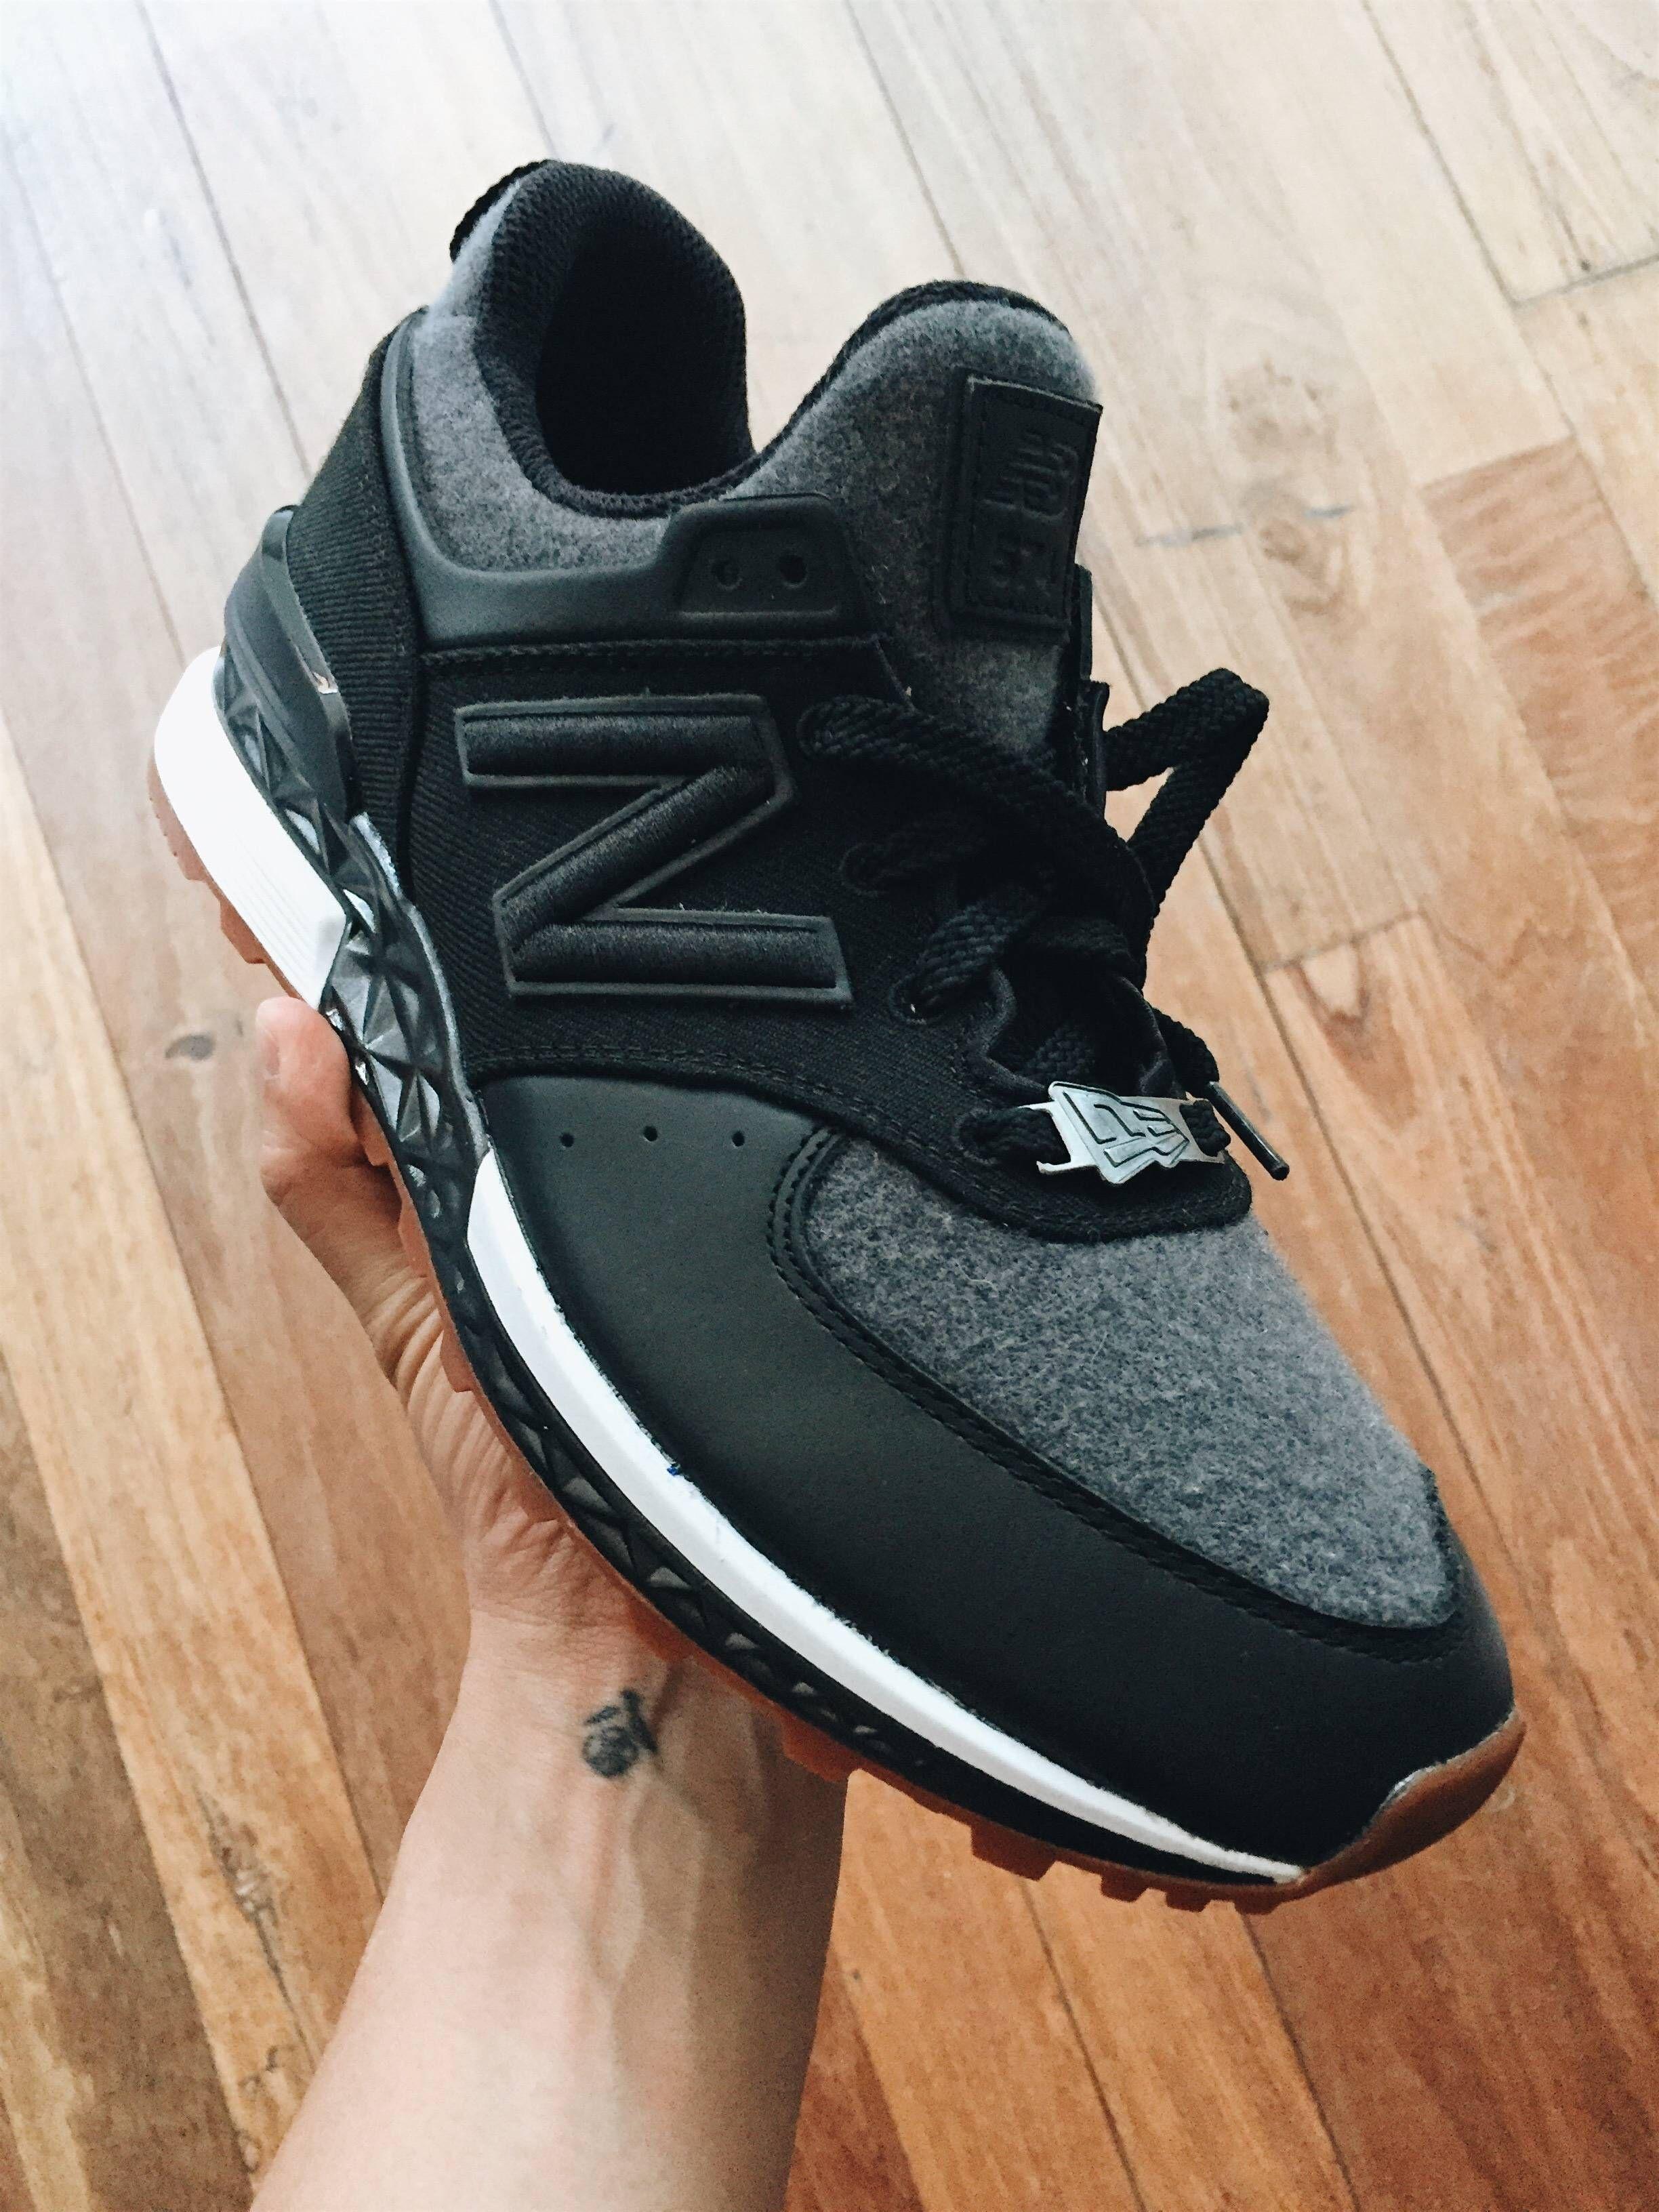 wholesale dealer fe542 c9a34 PICKUP] New Balance x New Era 574 Sport | Nike Sneakers ...